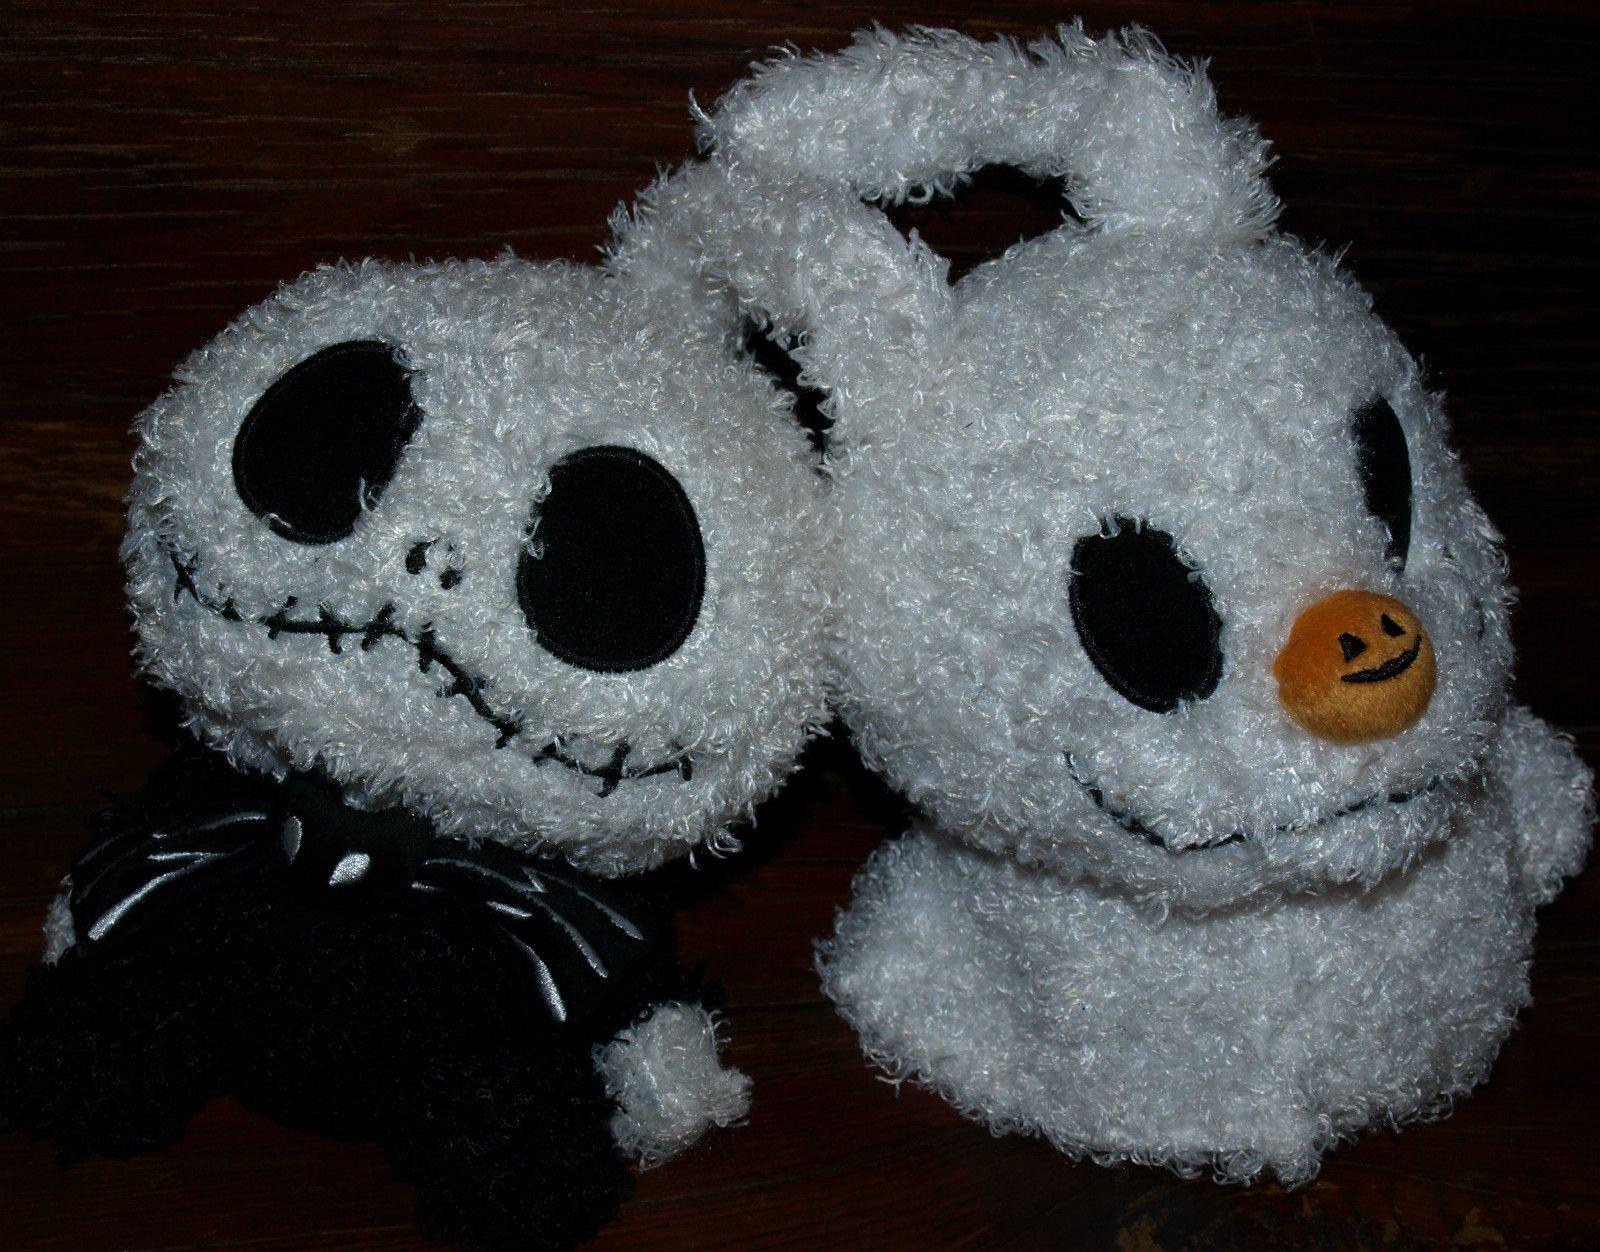 http://www.ebay.com/itm/DISNEY-BABY-JACK-SKELLINGTON-ZERO-NIGHTMARE ...